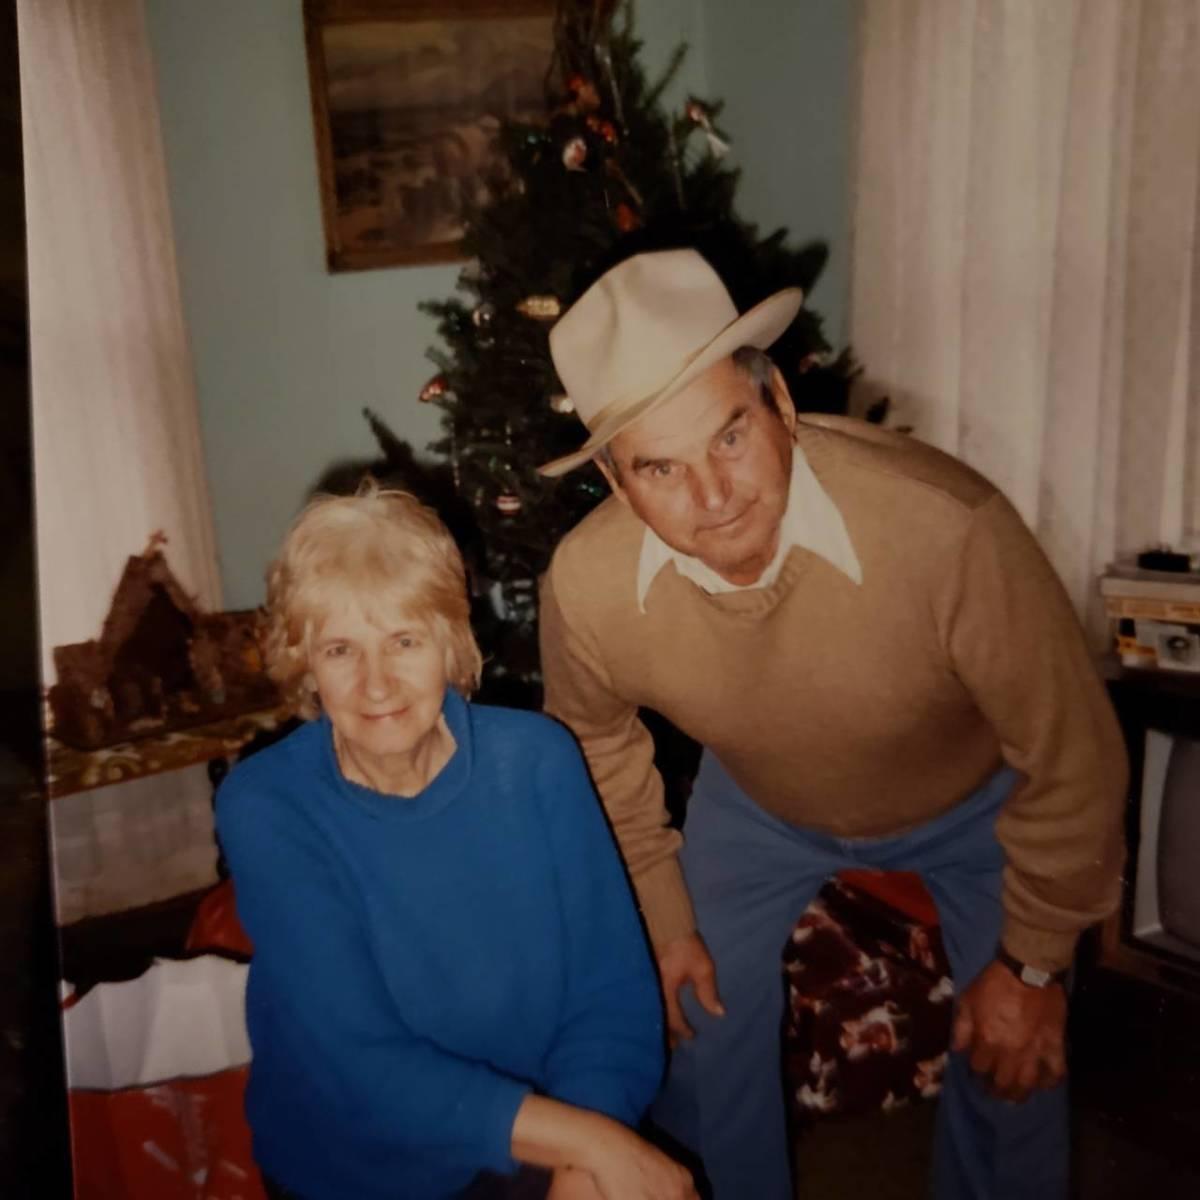 Mom and Dad at Christmas 1985.